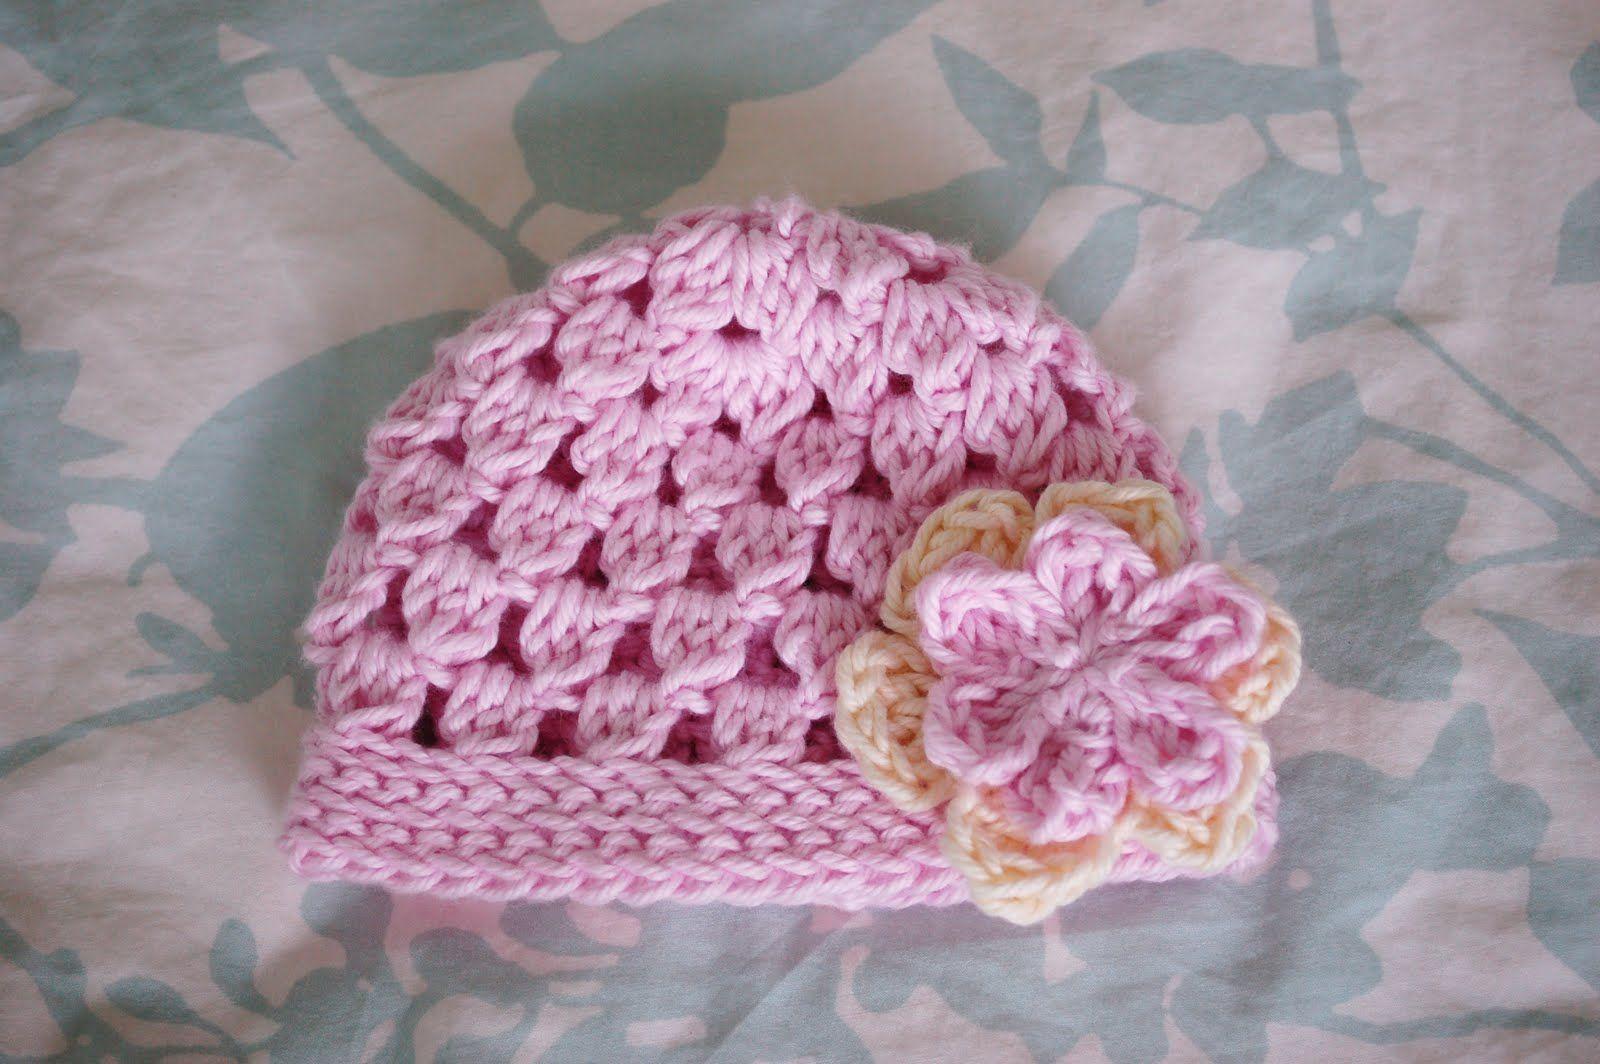 Pin By Pam Ball On Needlework Hook Crochet Baby Hat Patterns